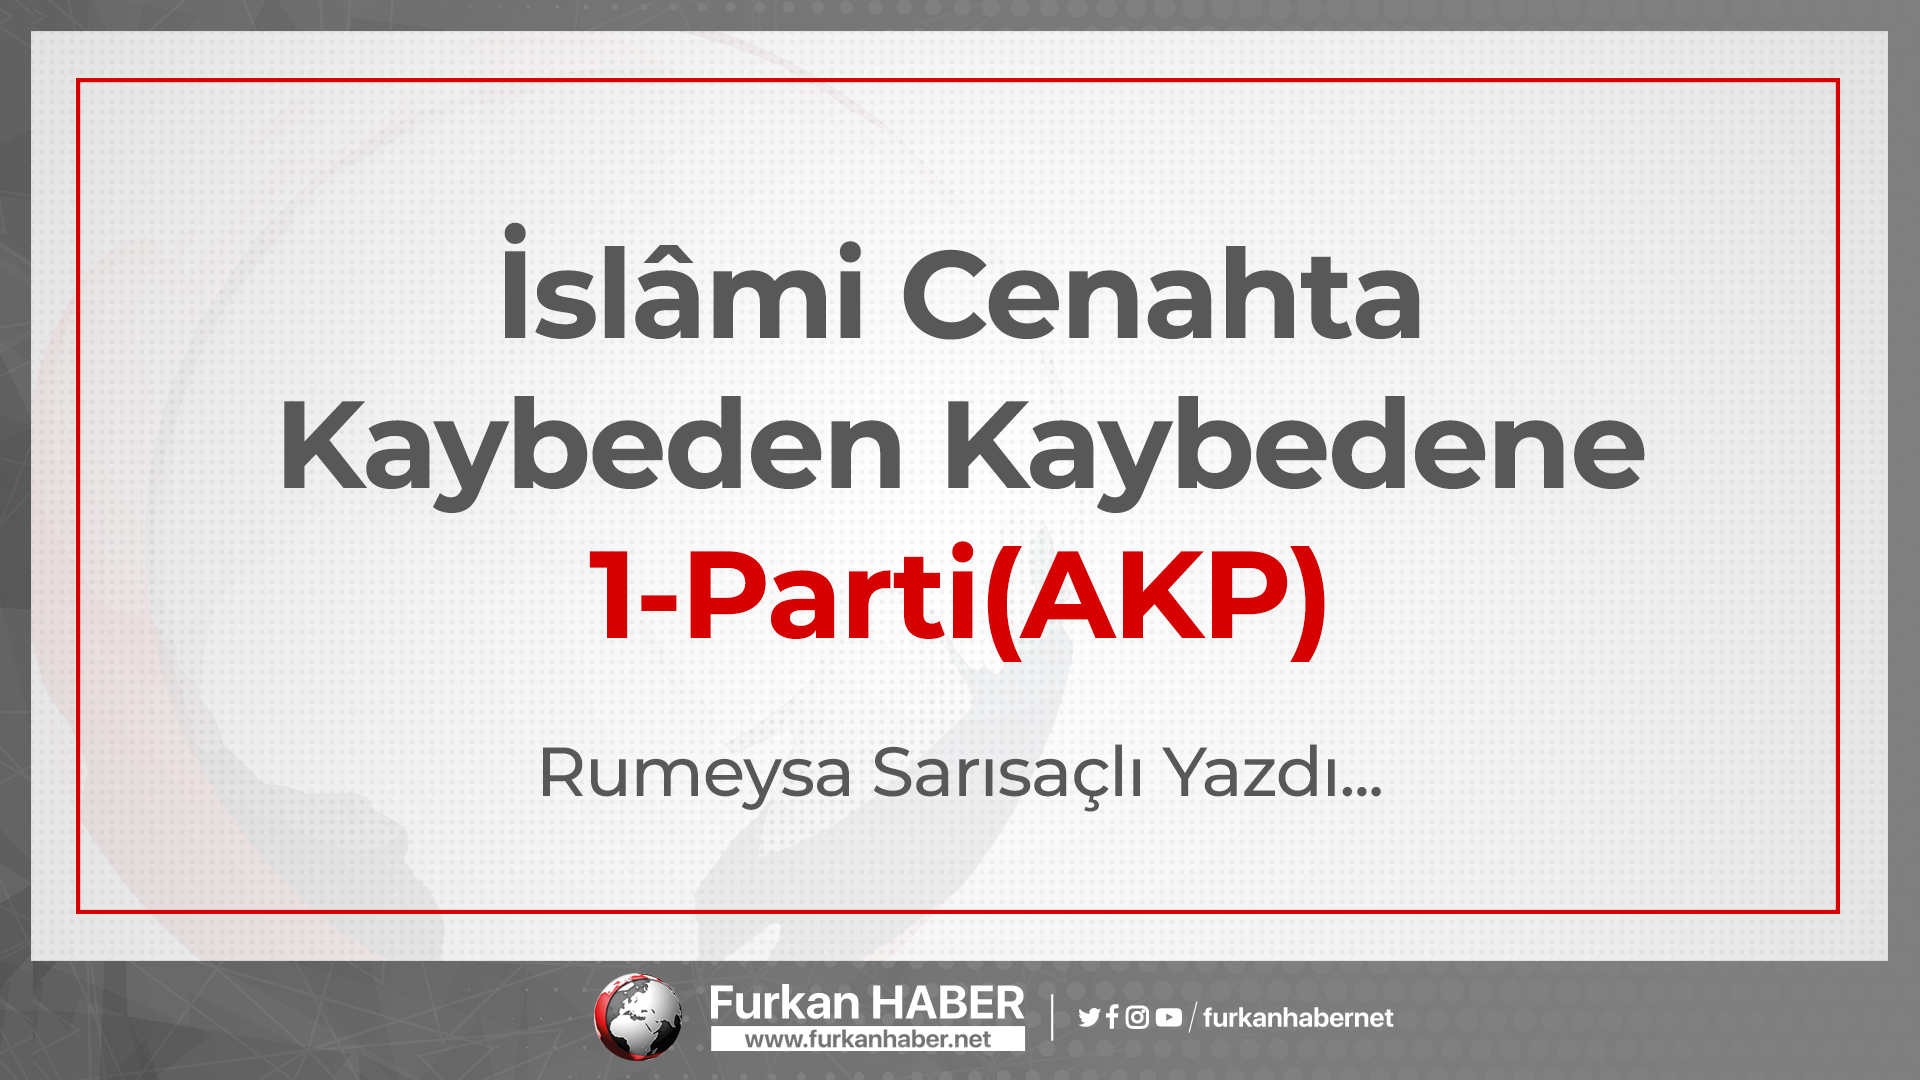 İslâmi Cenahta Kaybeden Kaybedene-1 Parti (AKP)